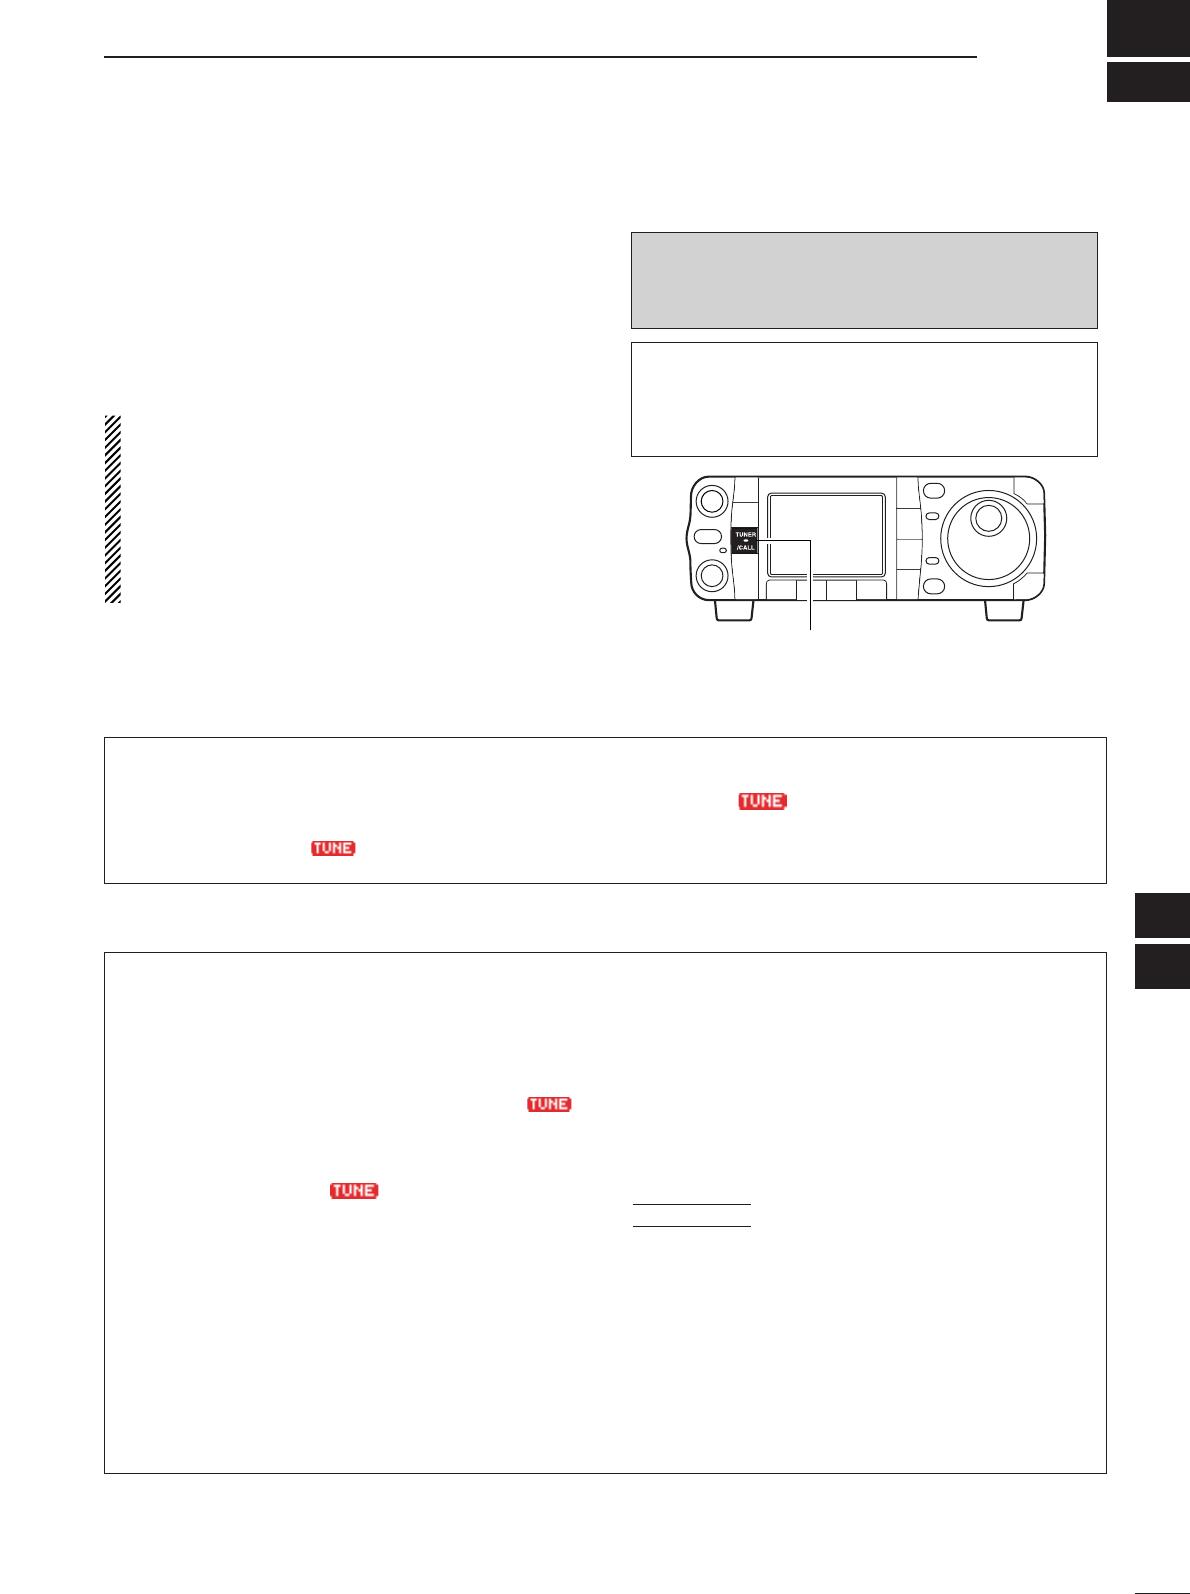 Handleiding Icom IC-7000 (pagina 125 van 166) (English) on